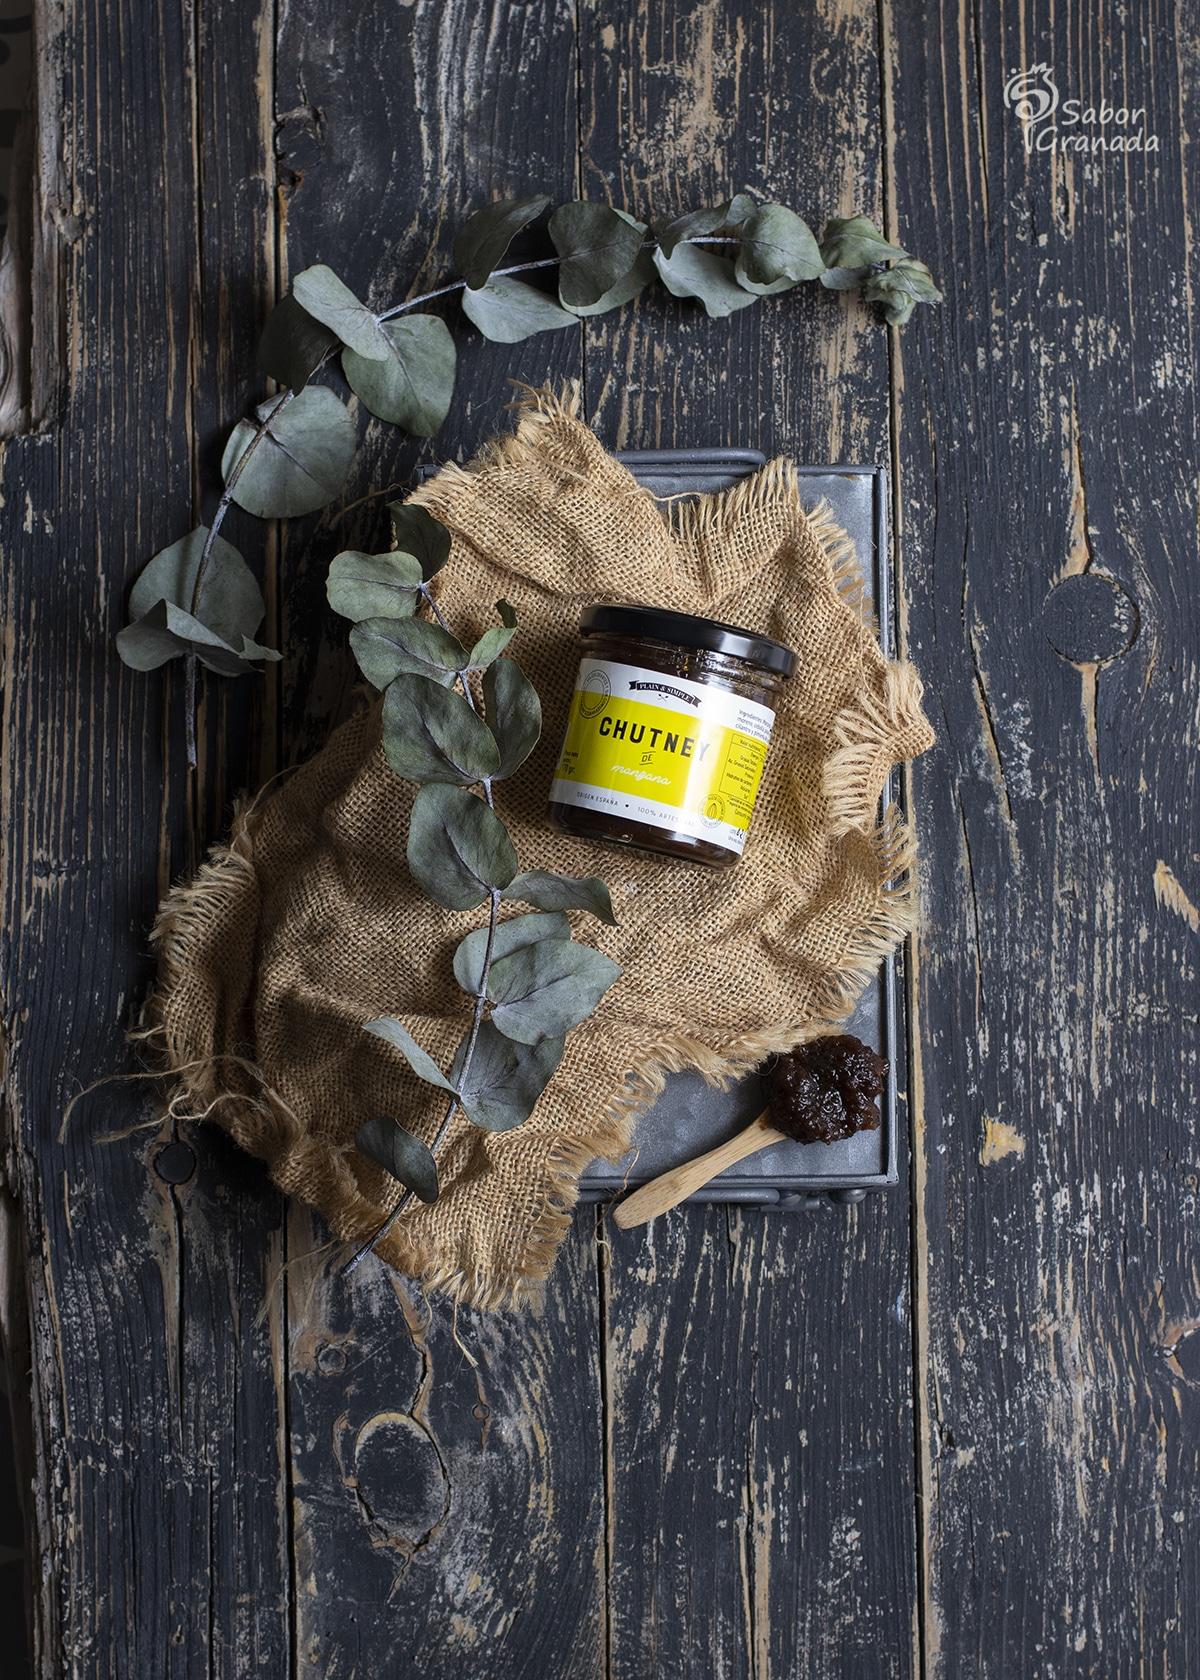 Chutney de manzana Plain and Simple - Sabor Granada